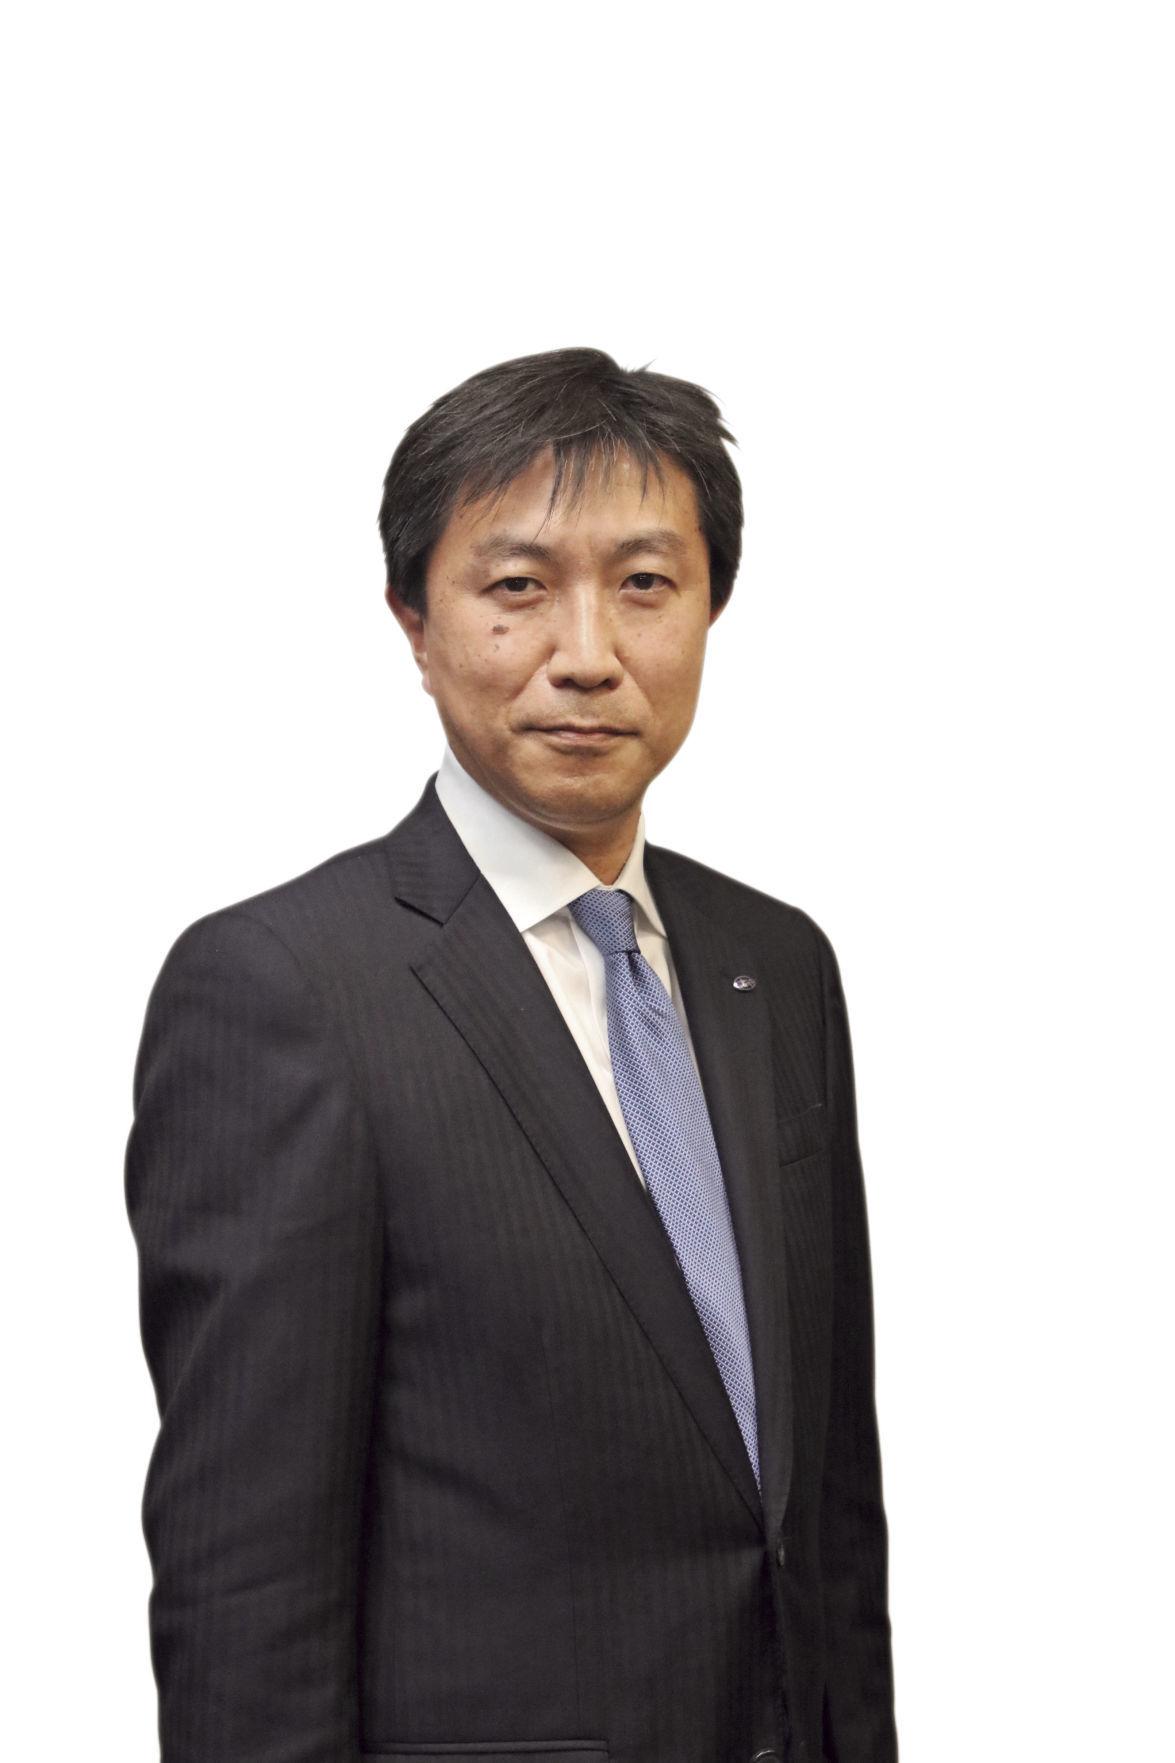 Ryota Fukumizu